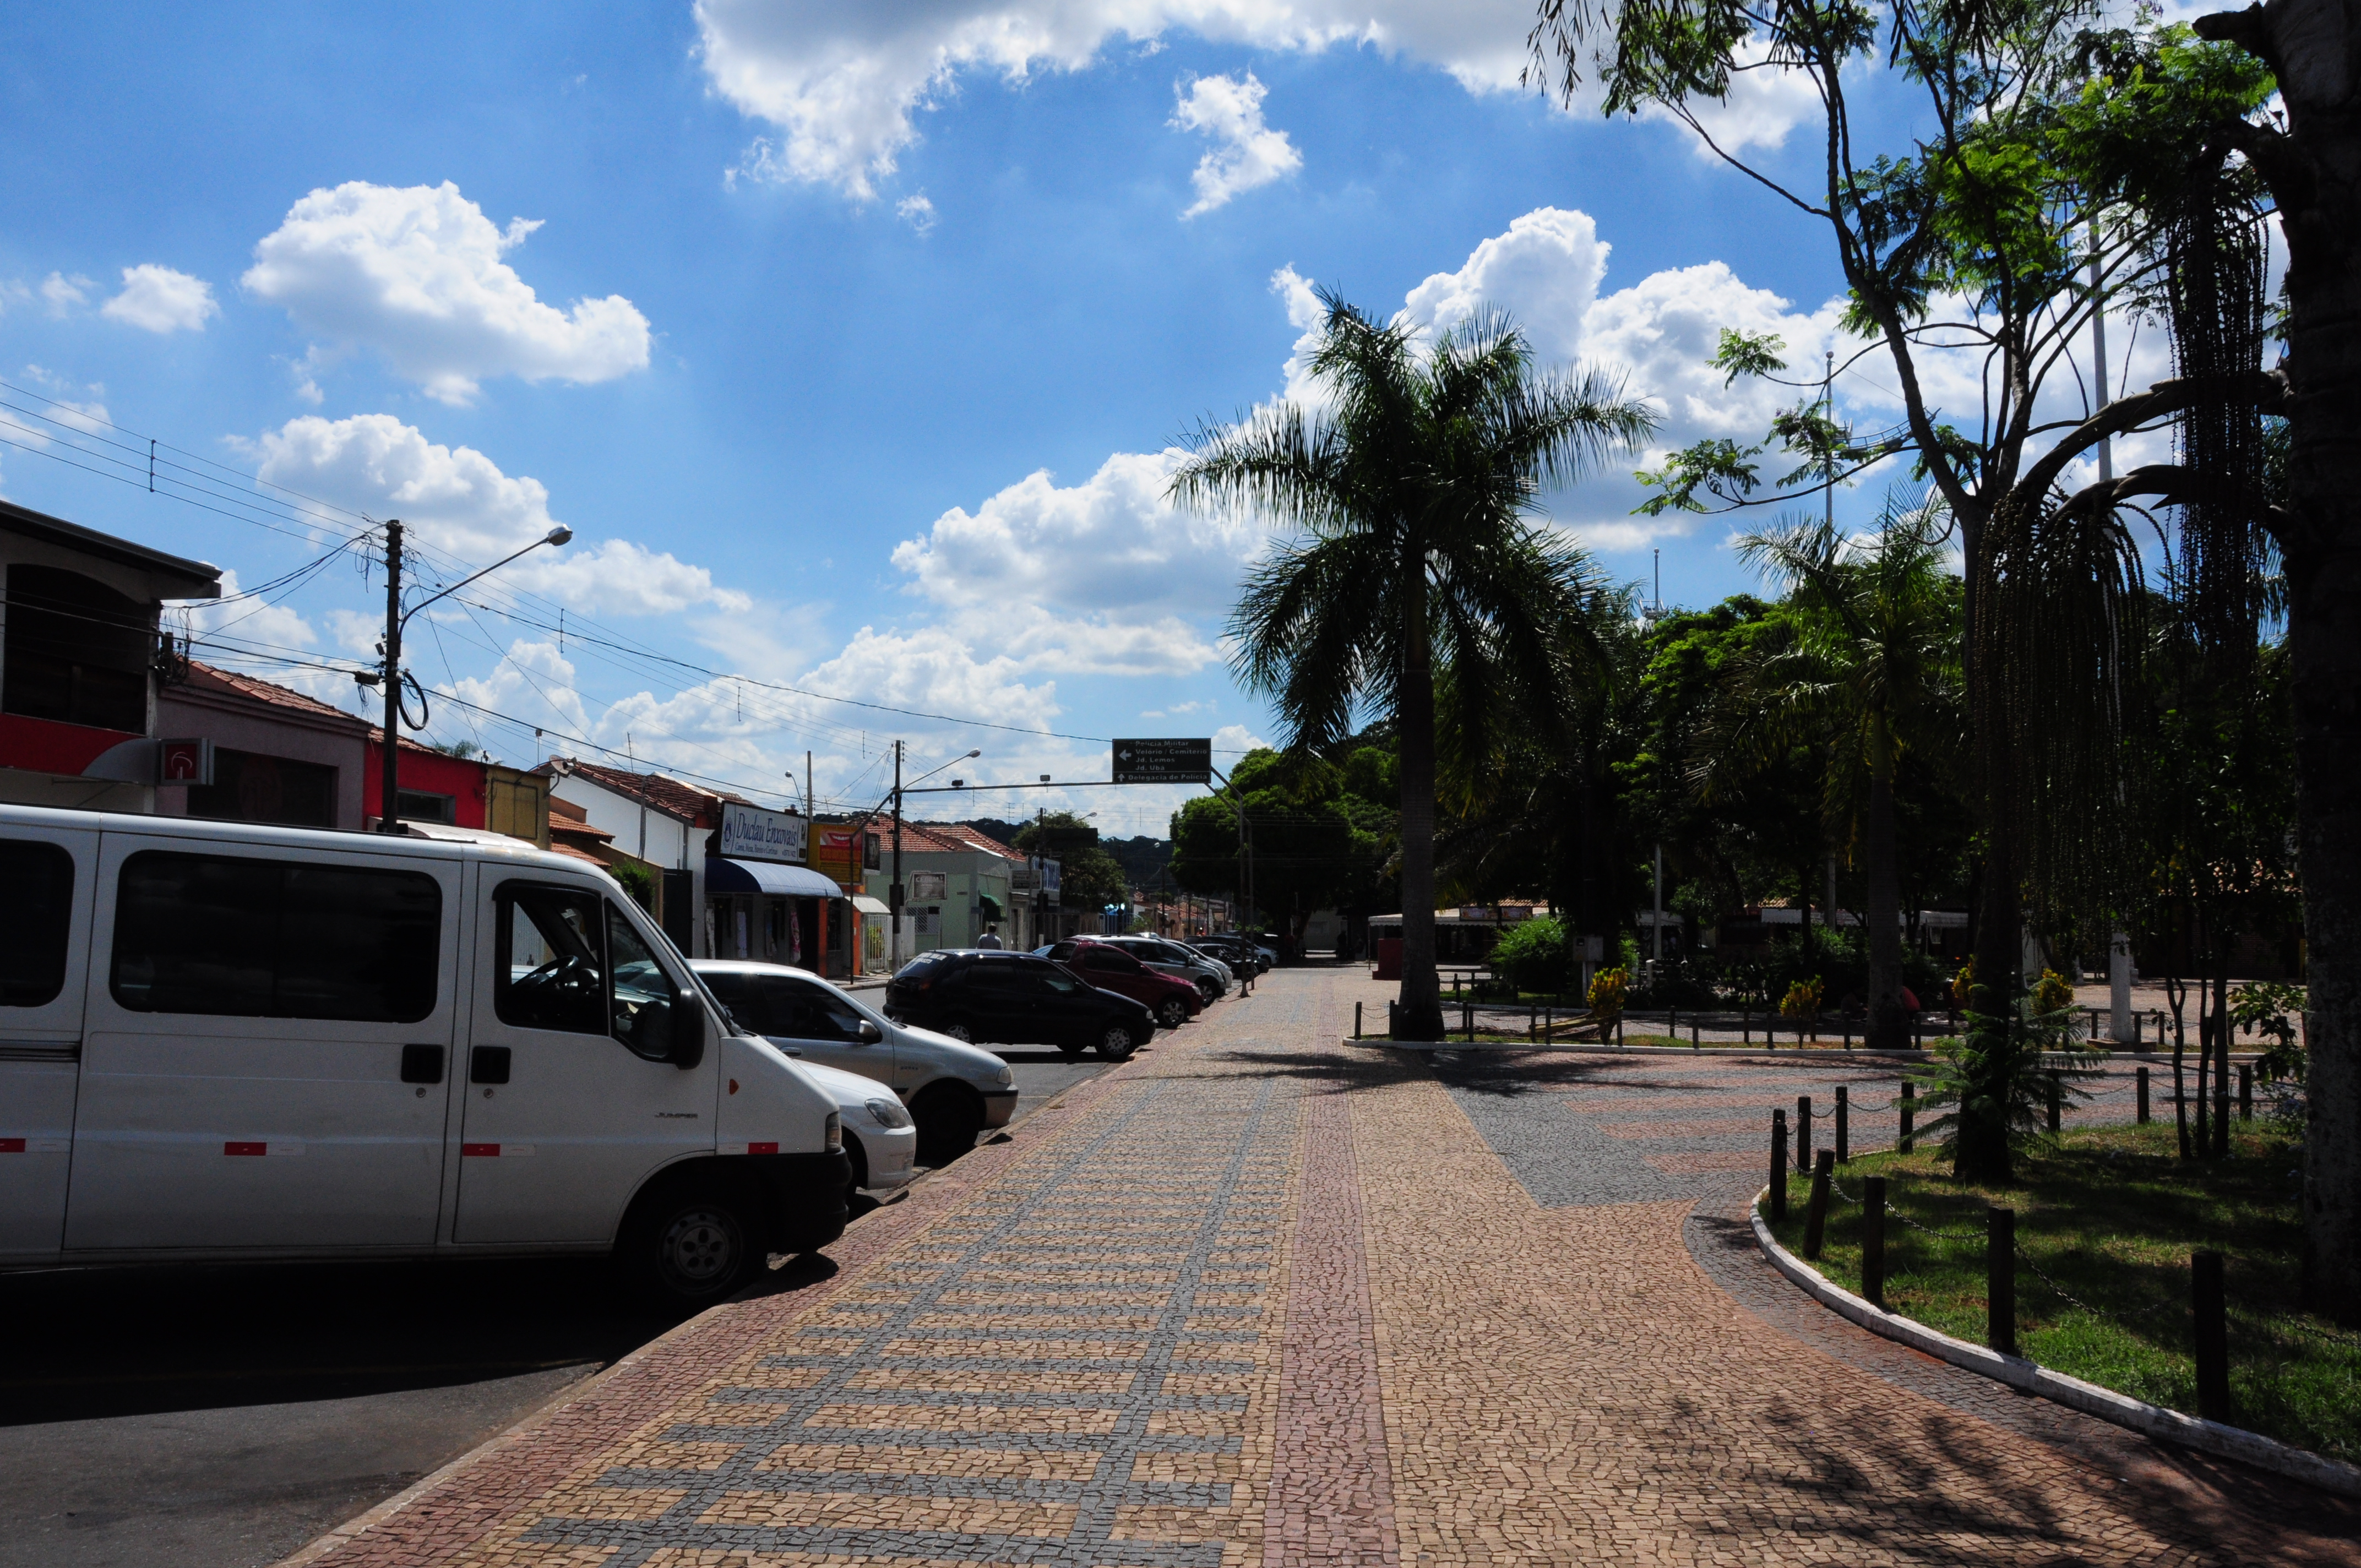 Itirapina São Paulo fonte: upload.wikimedia.org